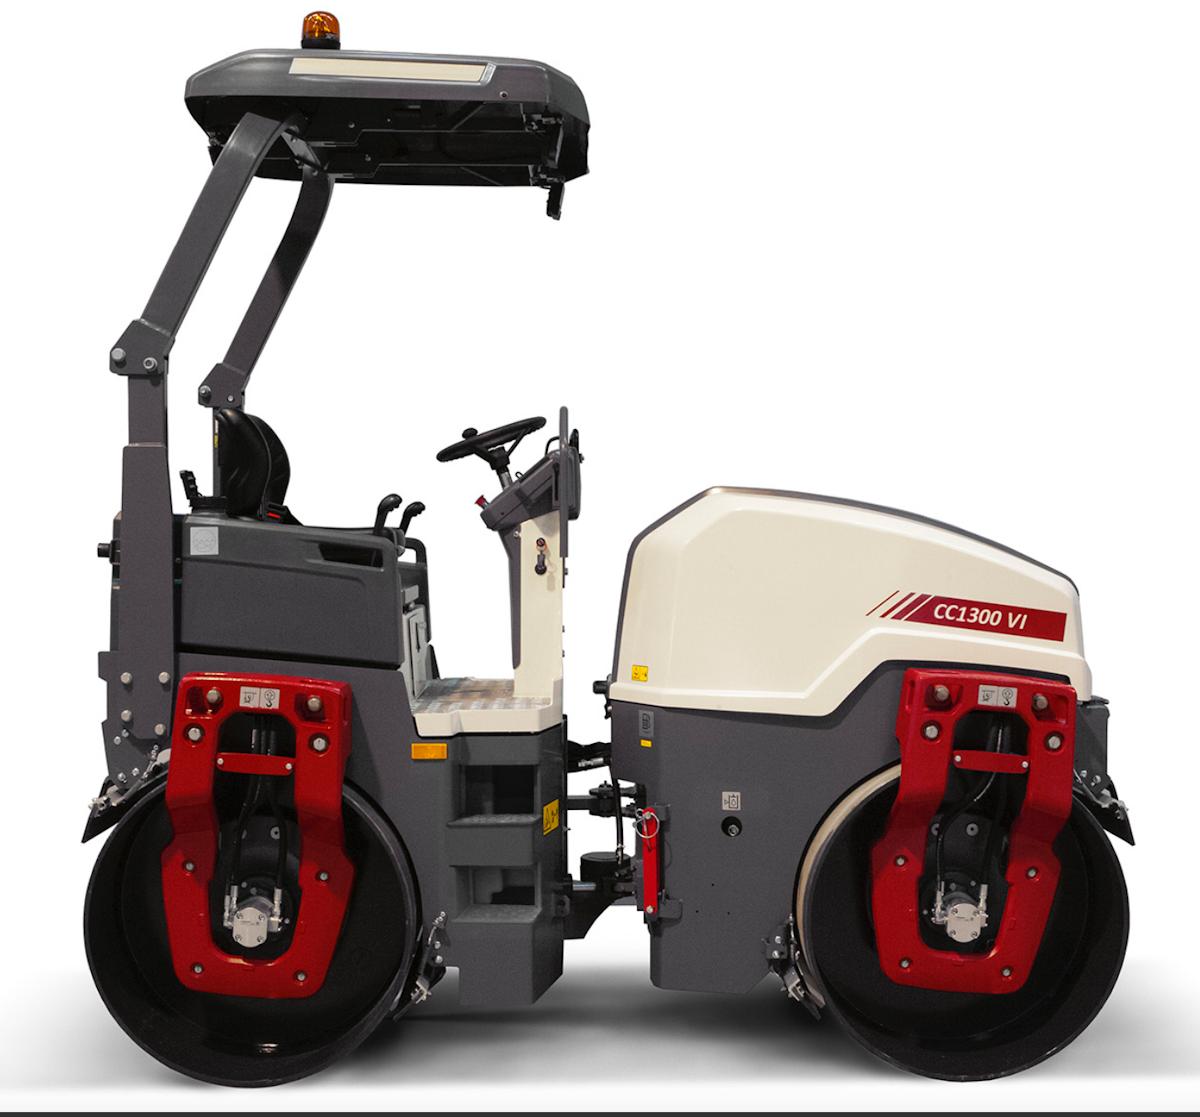 Dynapac's new CC1300 VI compactor improves operator visibility, comfort